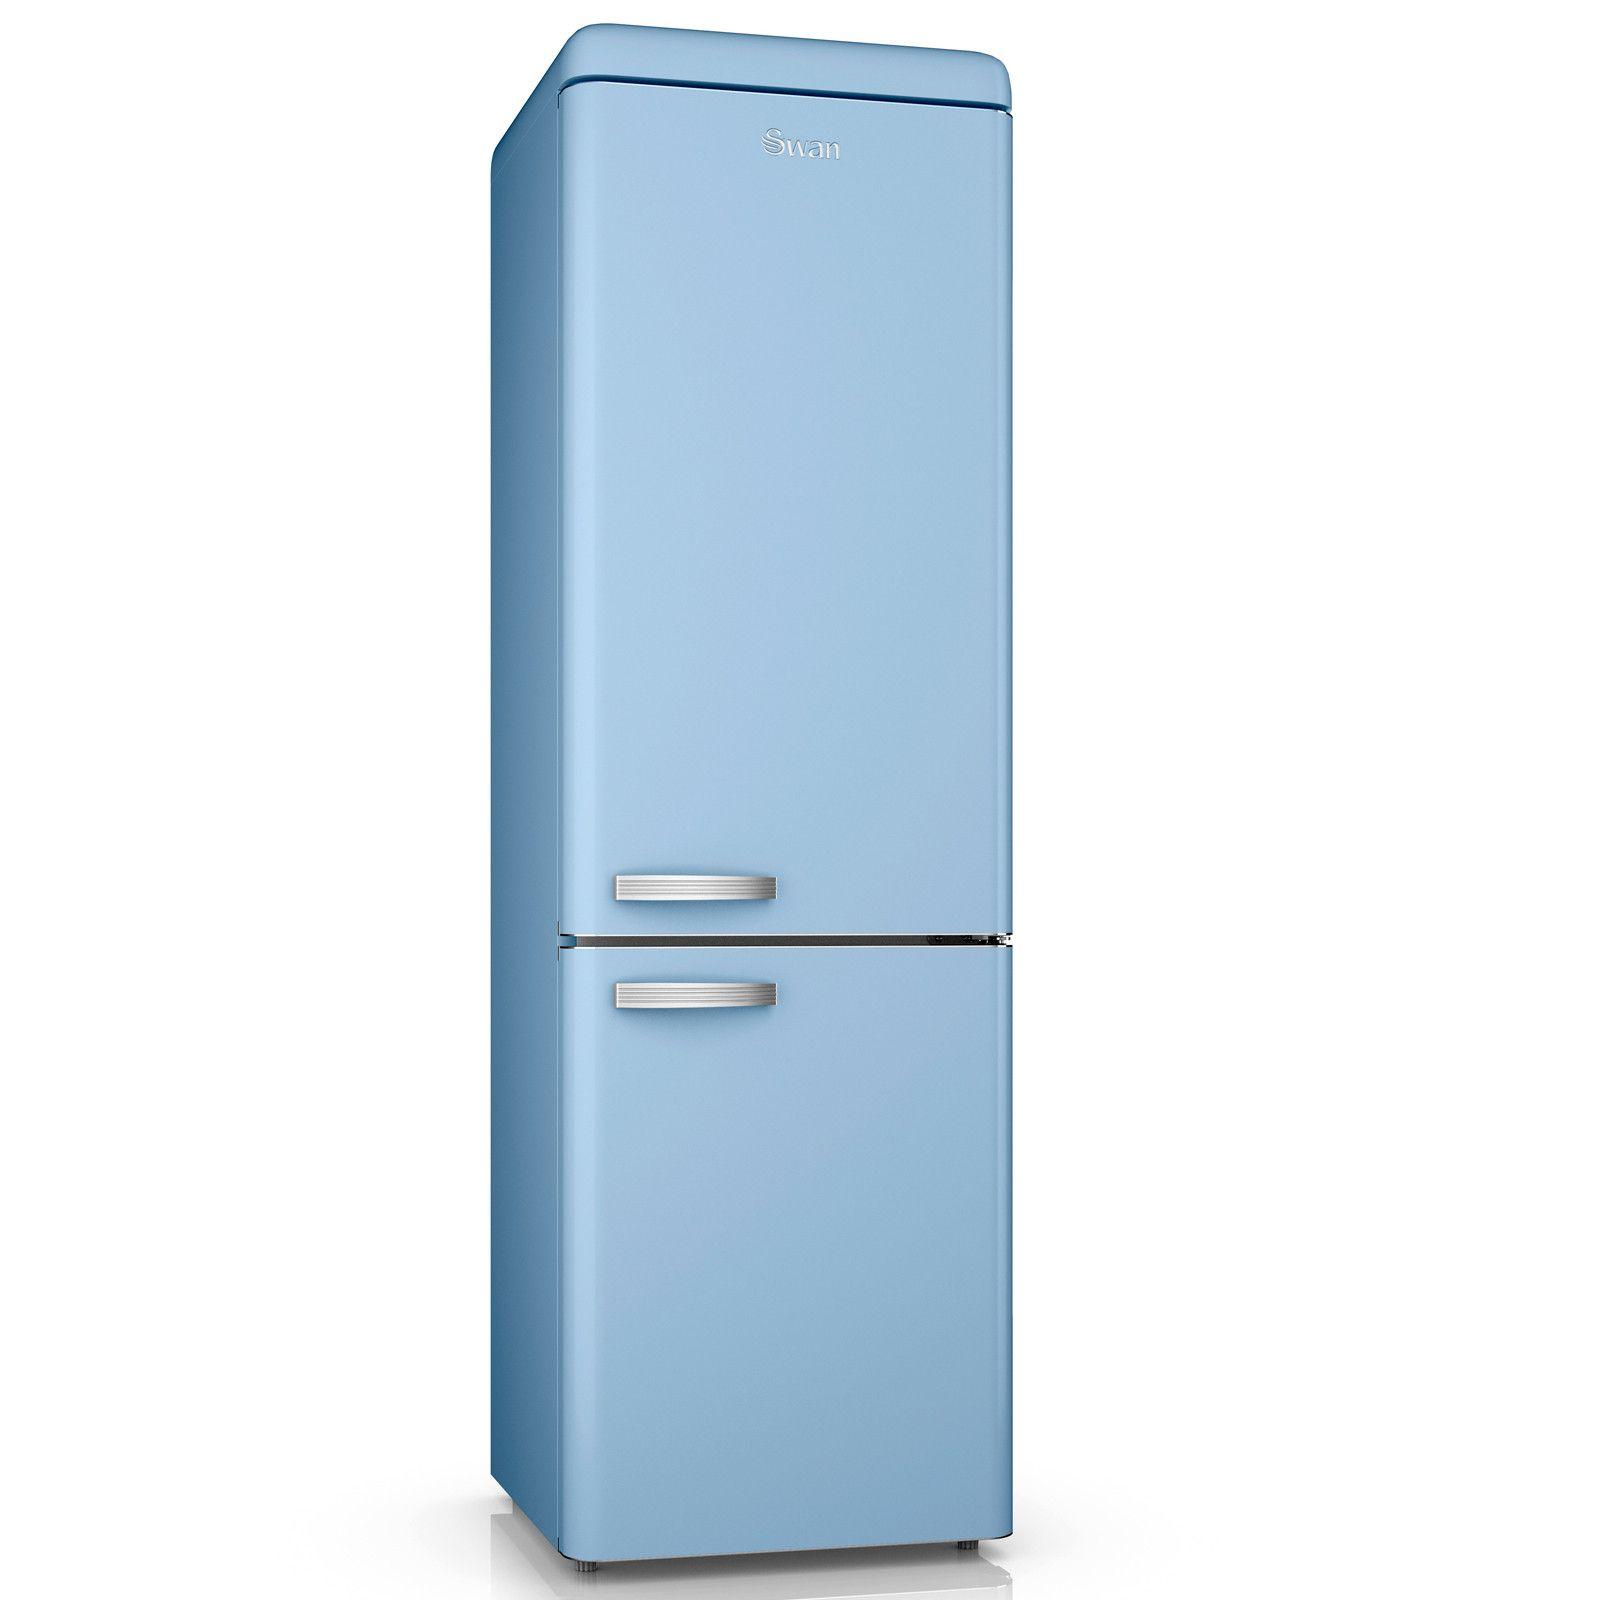 Swan Retro Blue 70/30 Fridge Freezer | Kitchen | Pinterest